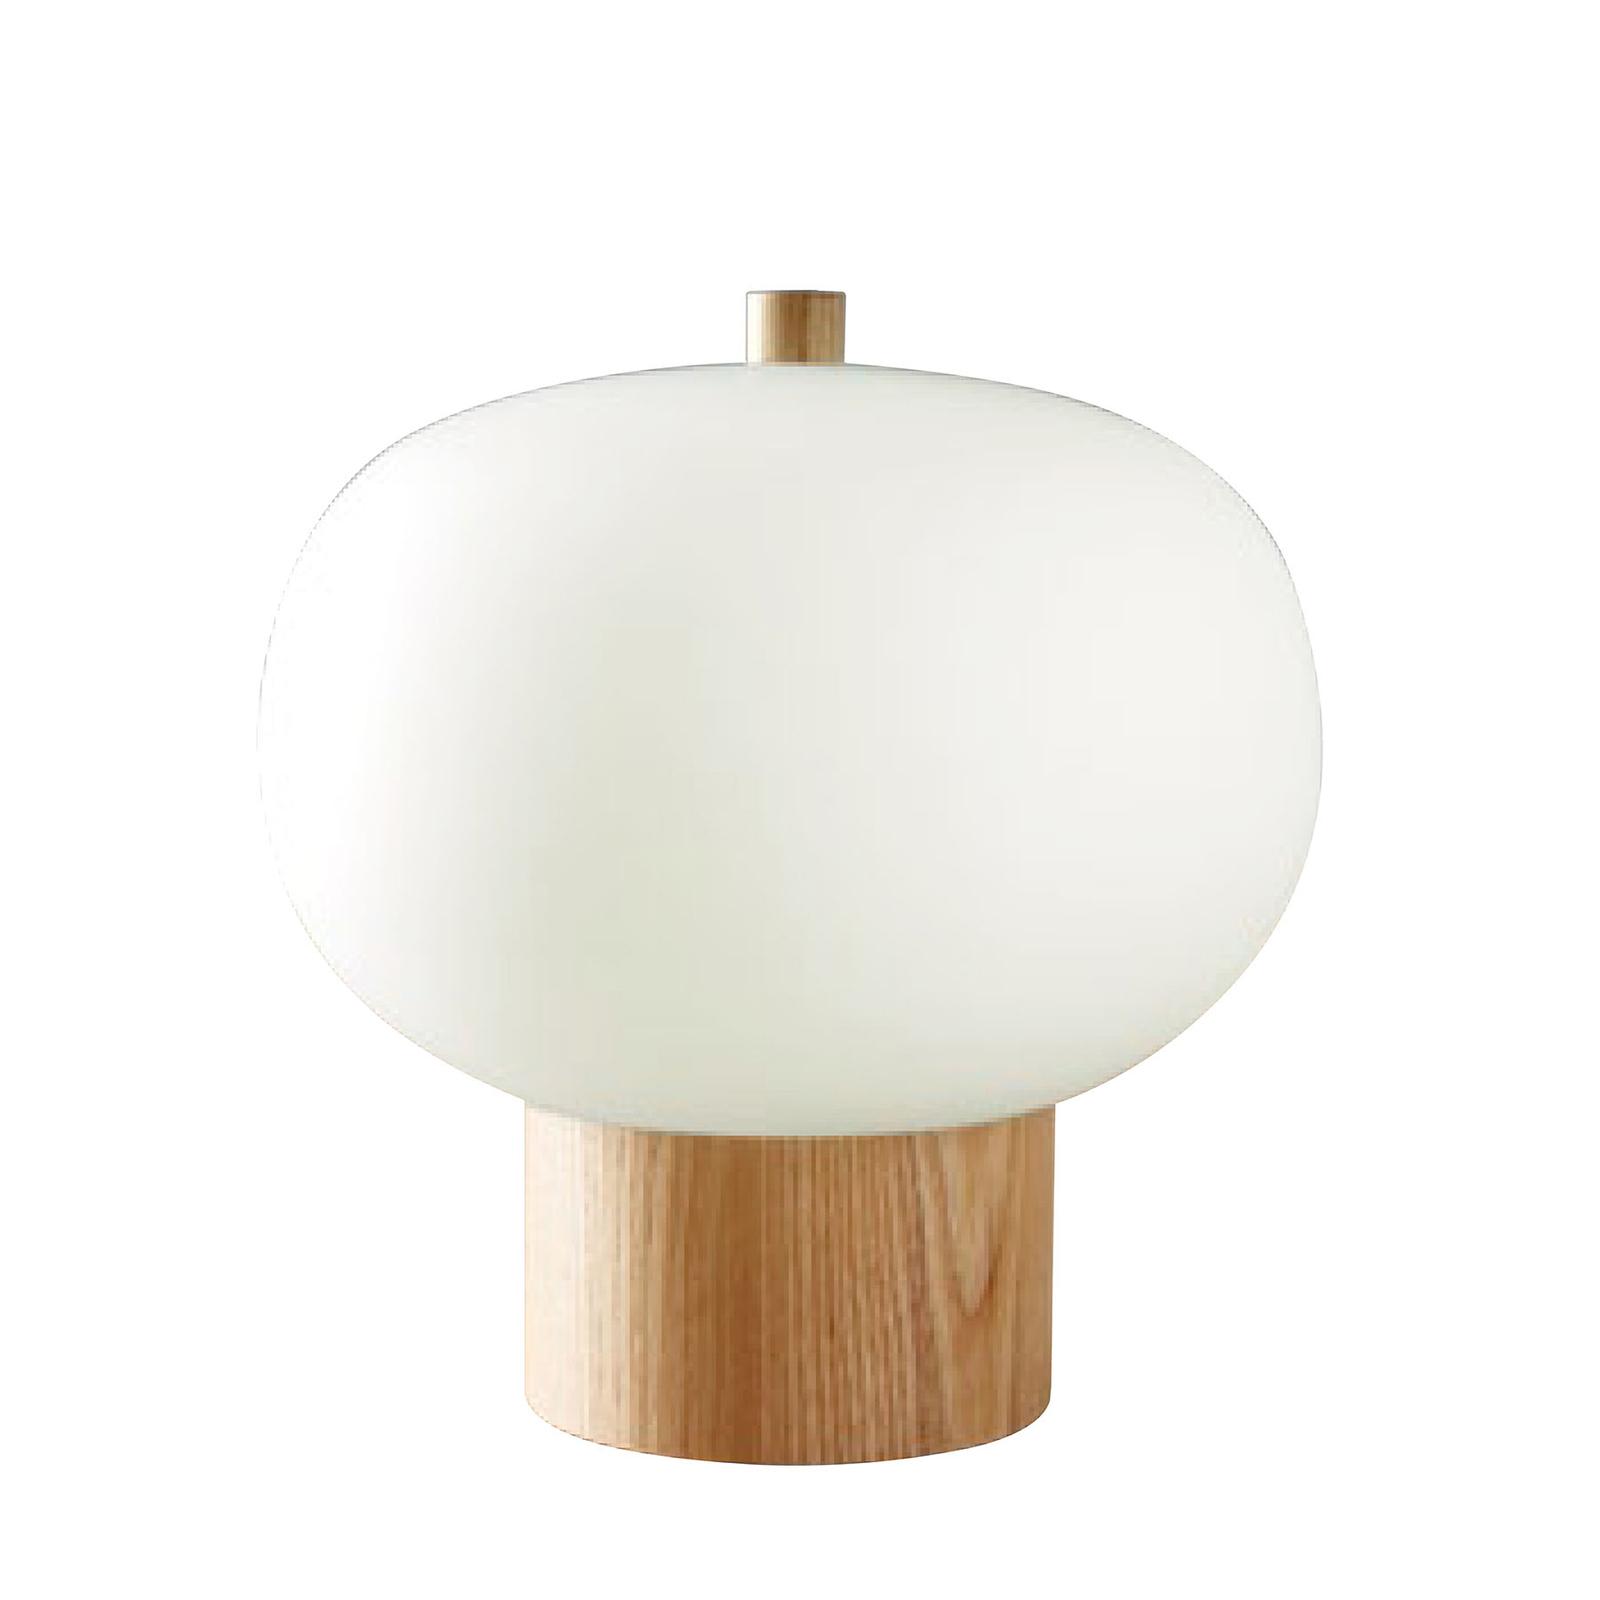 Grok Ilargi LED-bordlampe lys Ø 24 cm touchdimmer